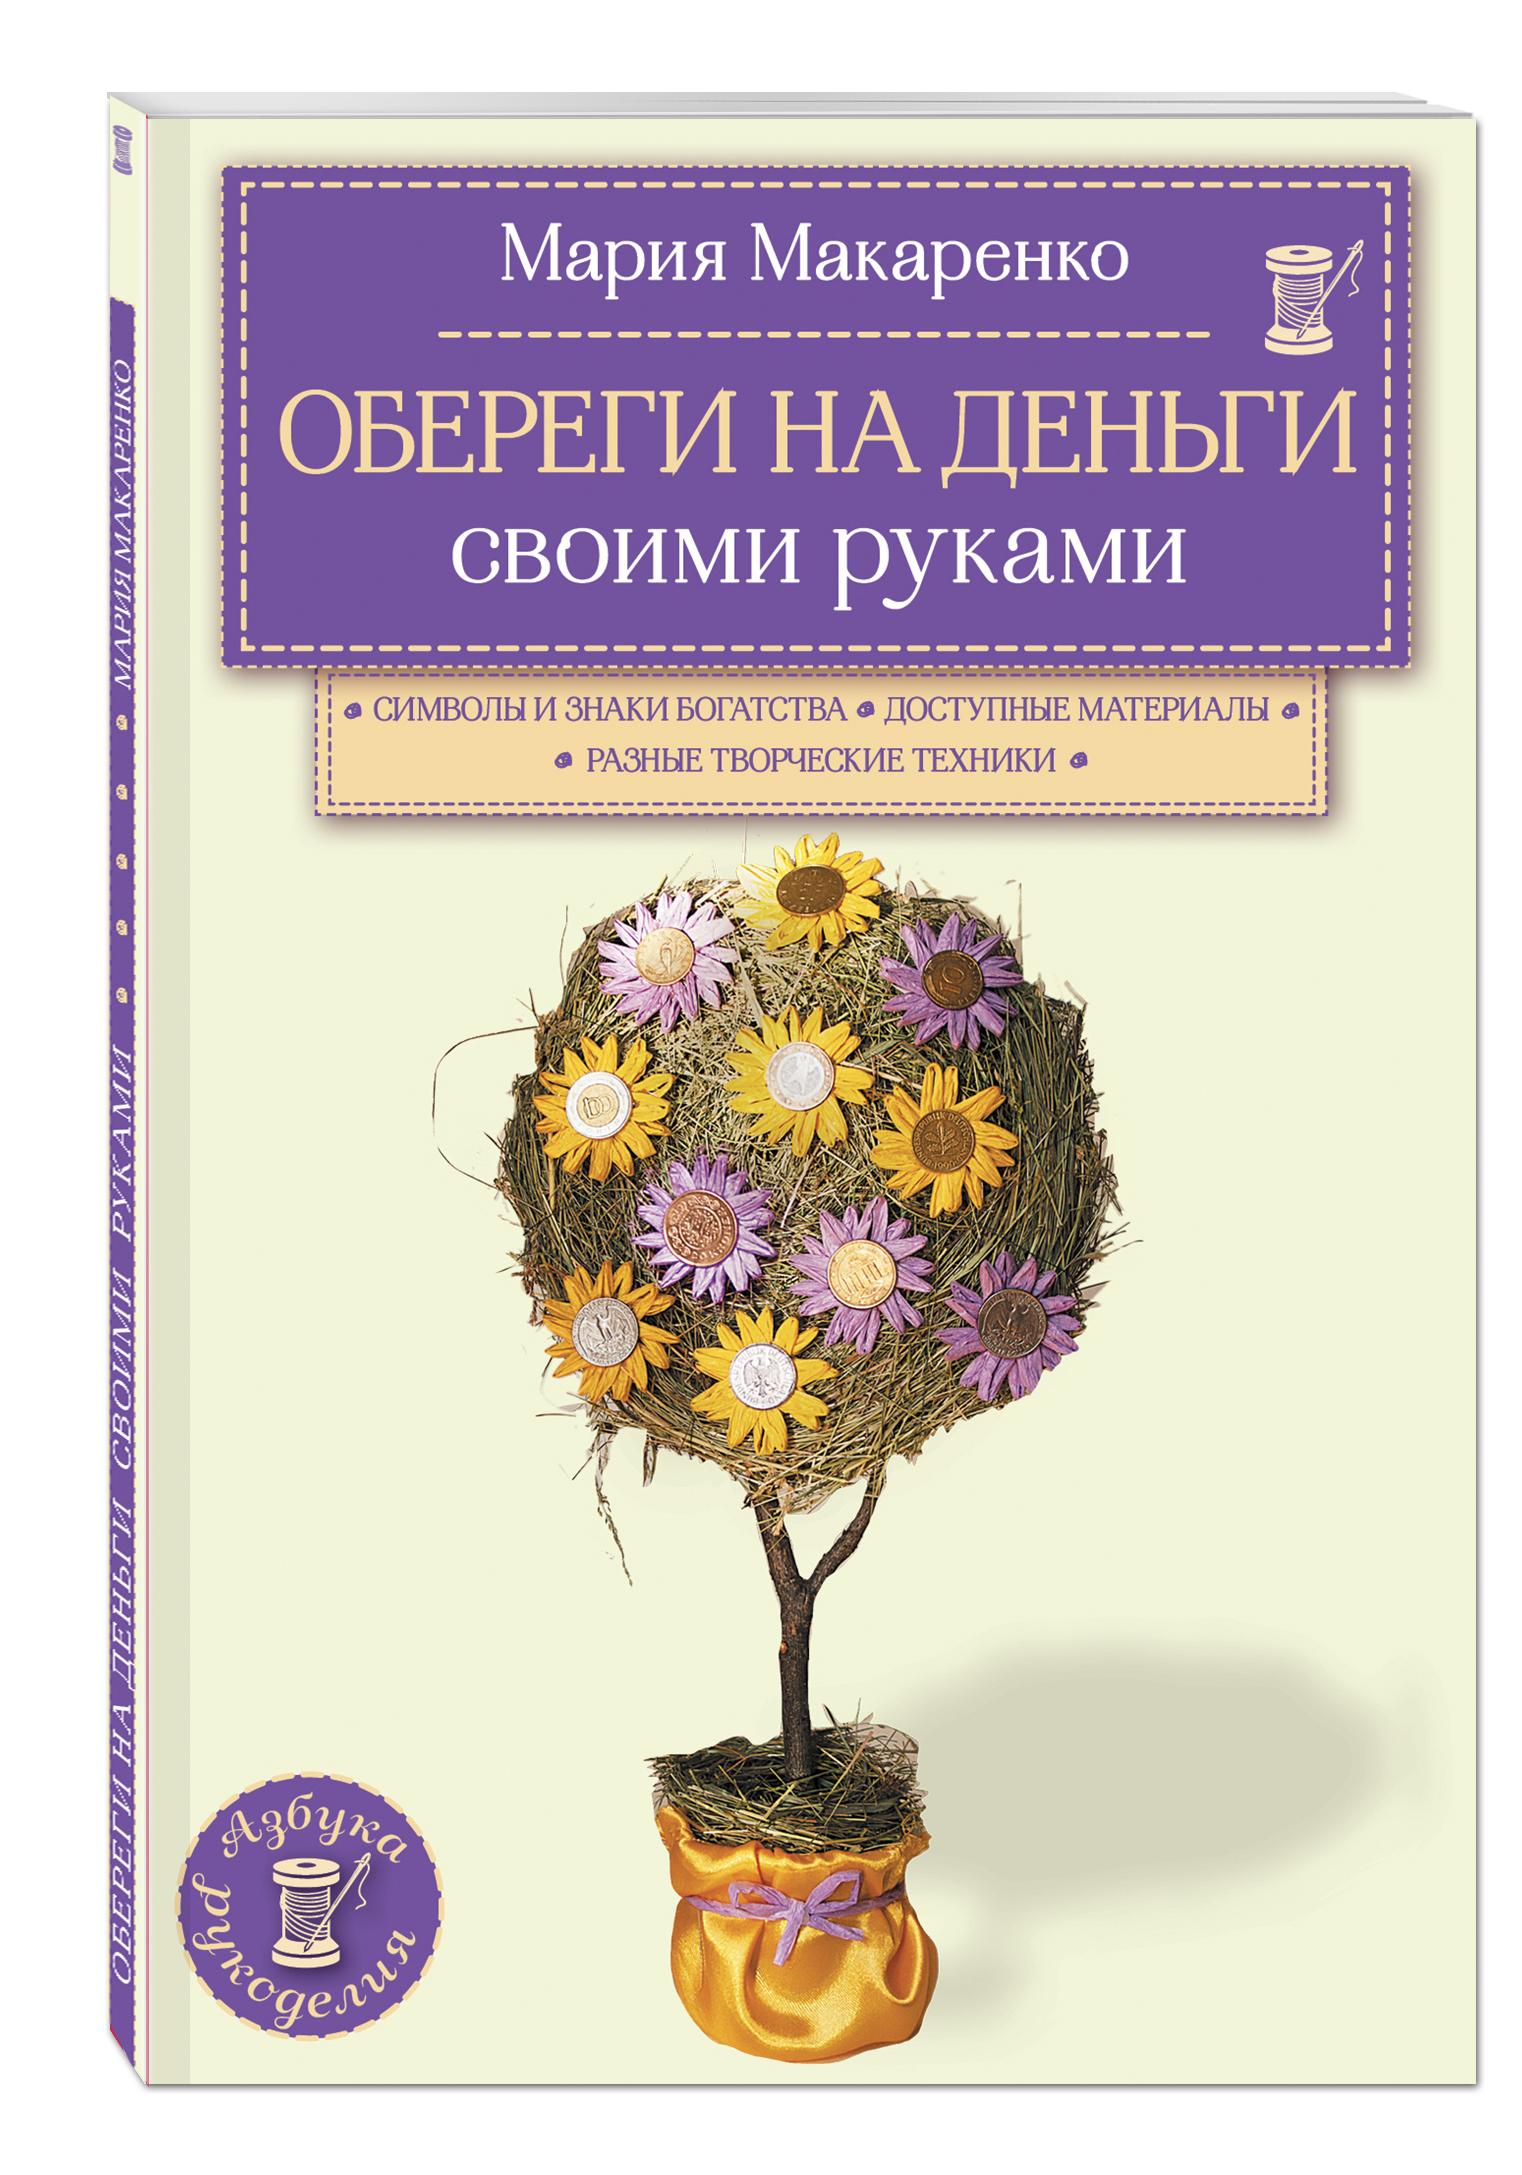 Обереги на деньги своими руками от book24.ru